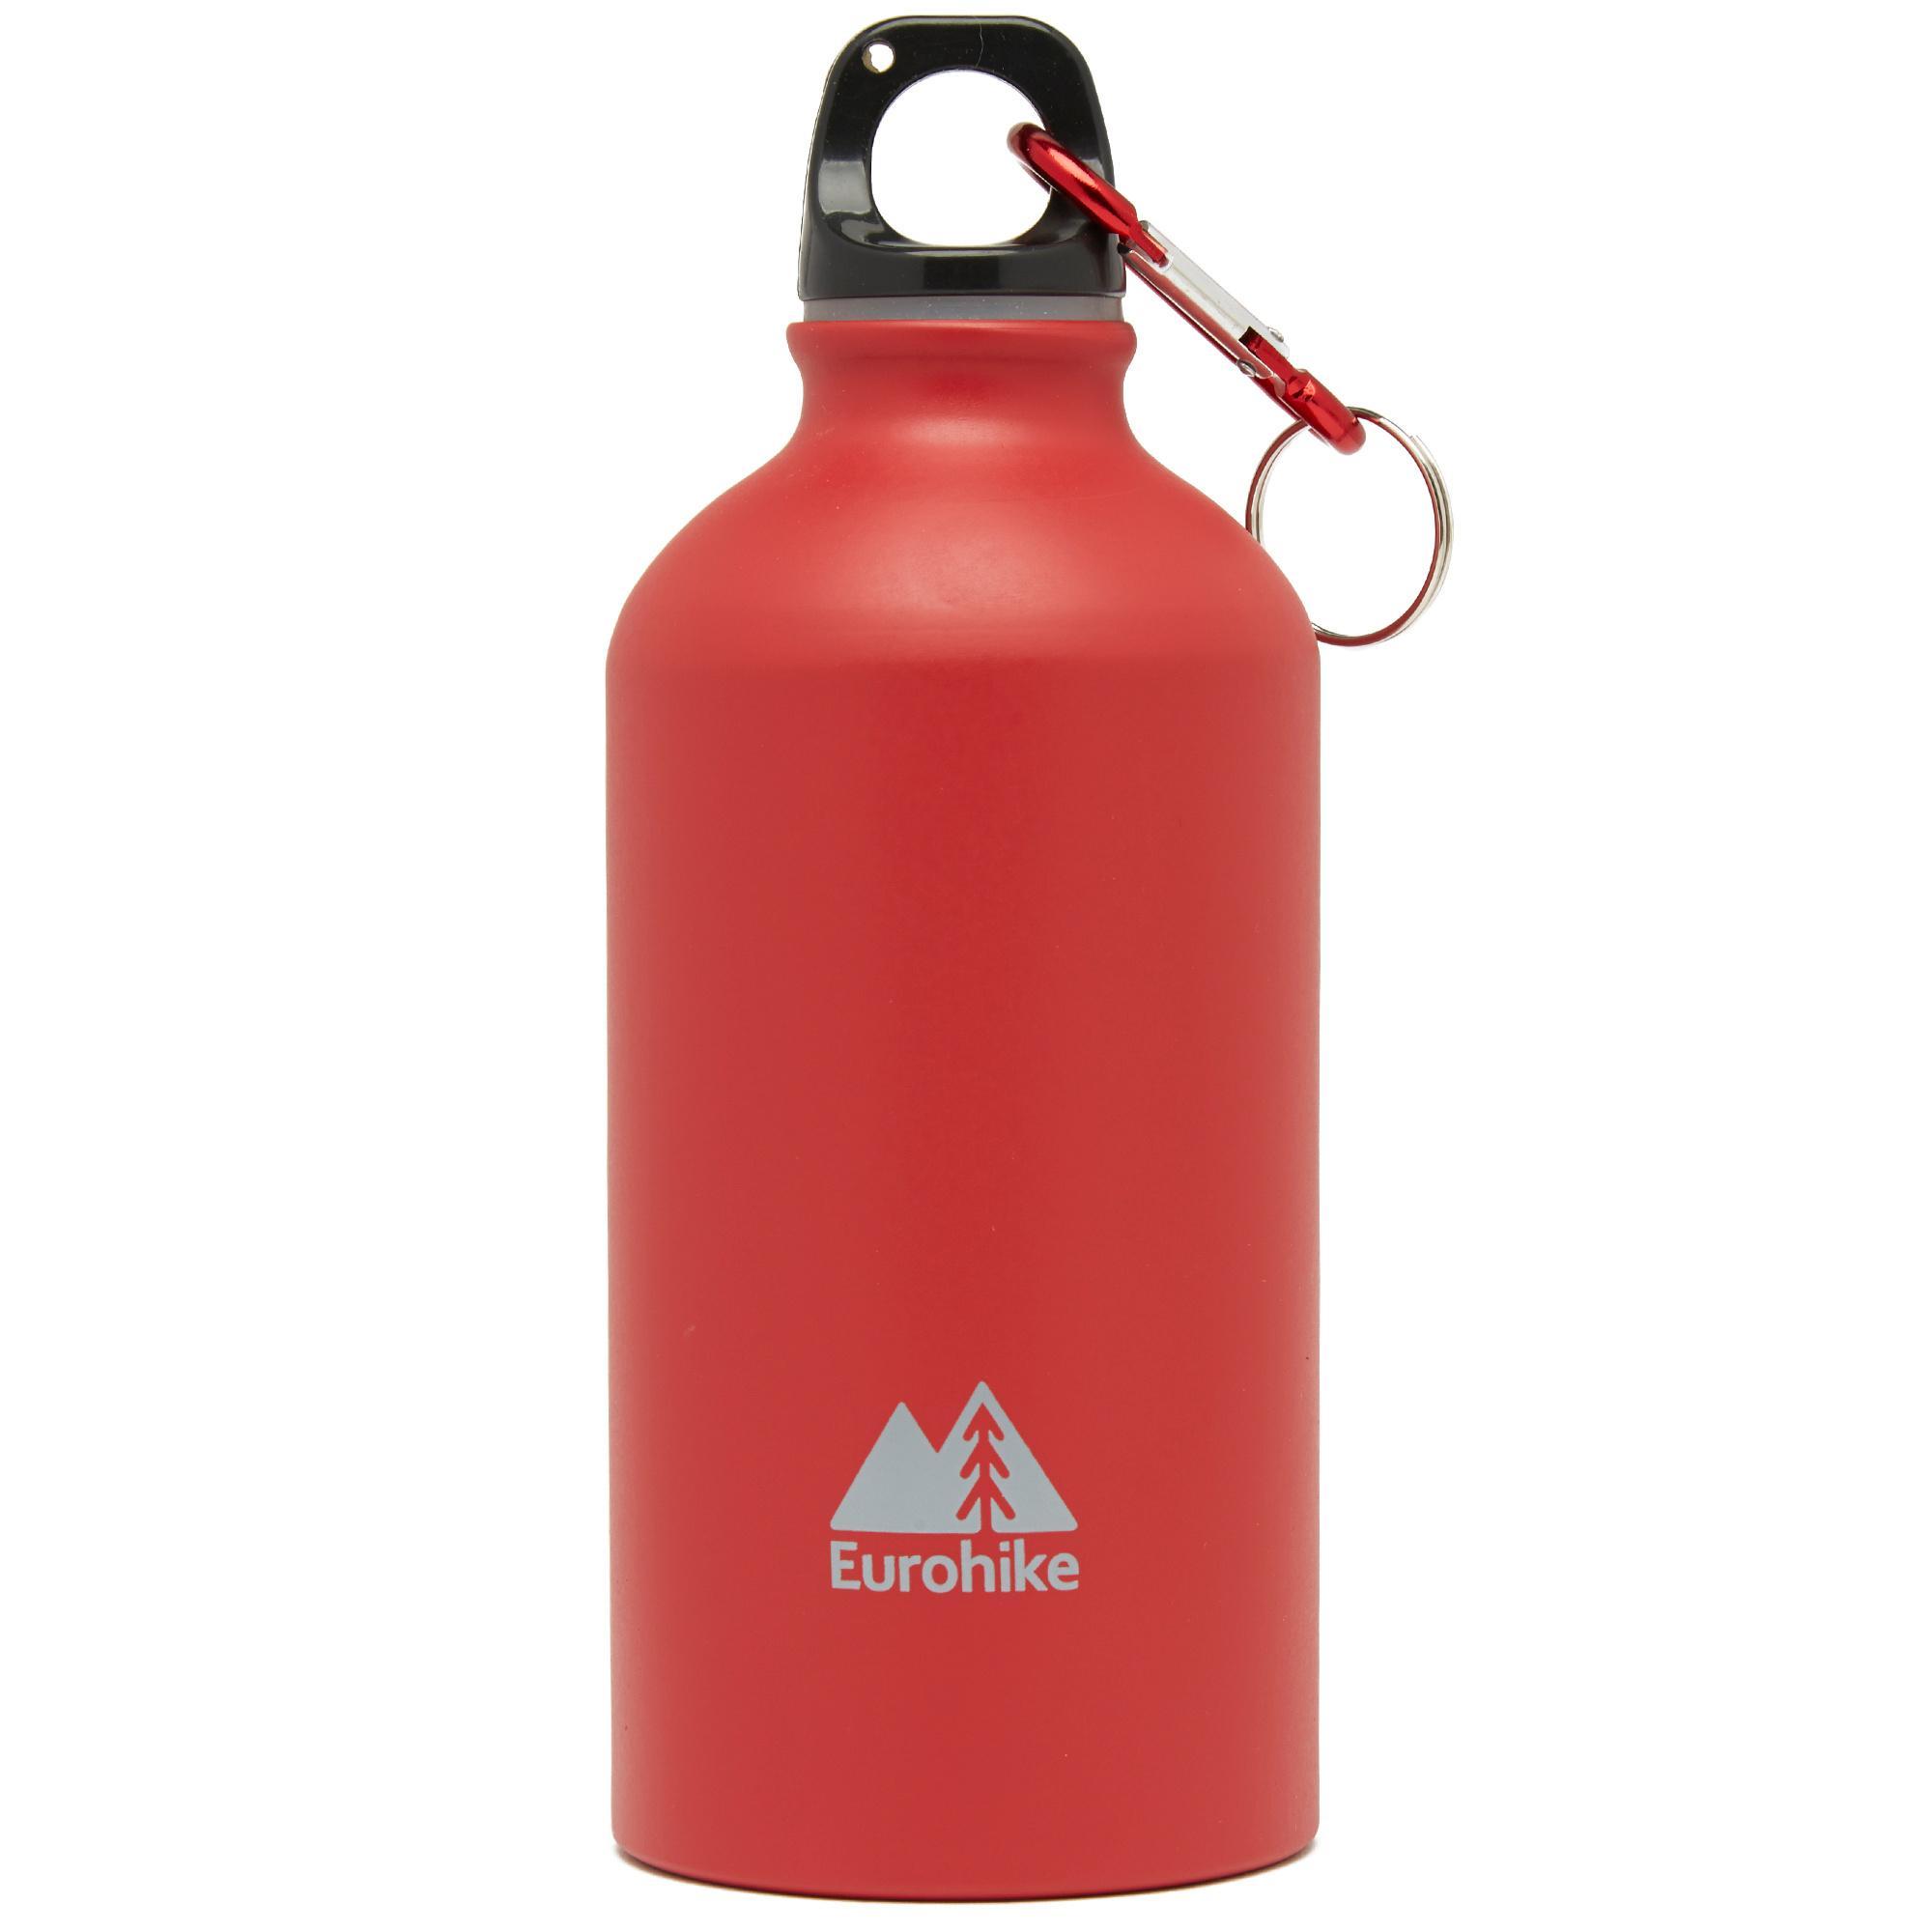 Eurohike Aqua 0.5l Aluminium Bottle - Red/red  Red/red